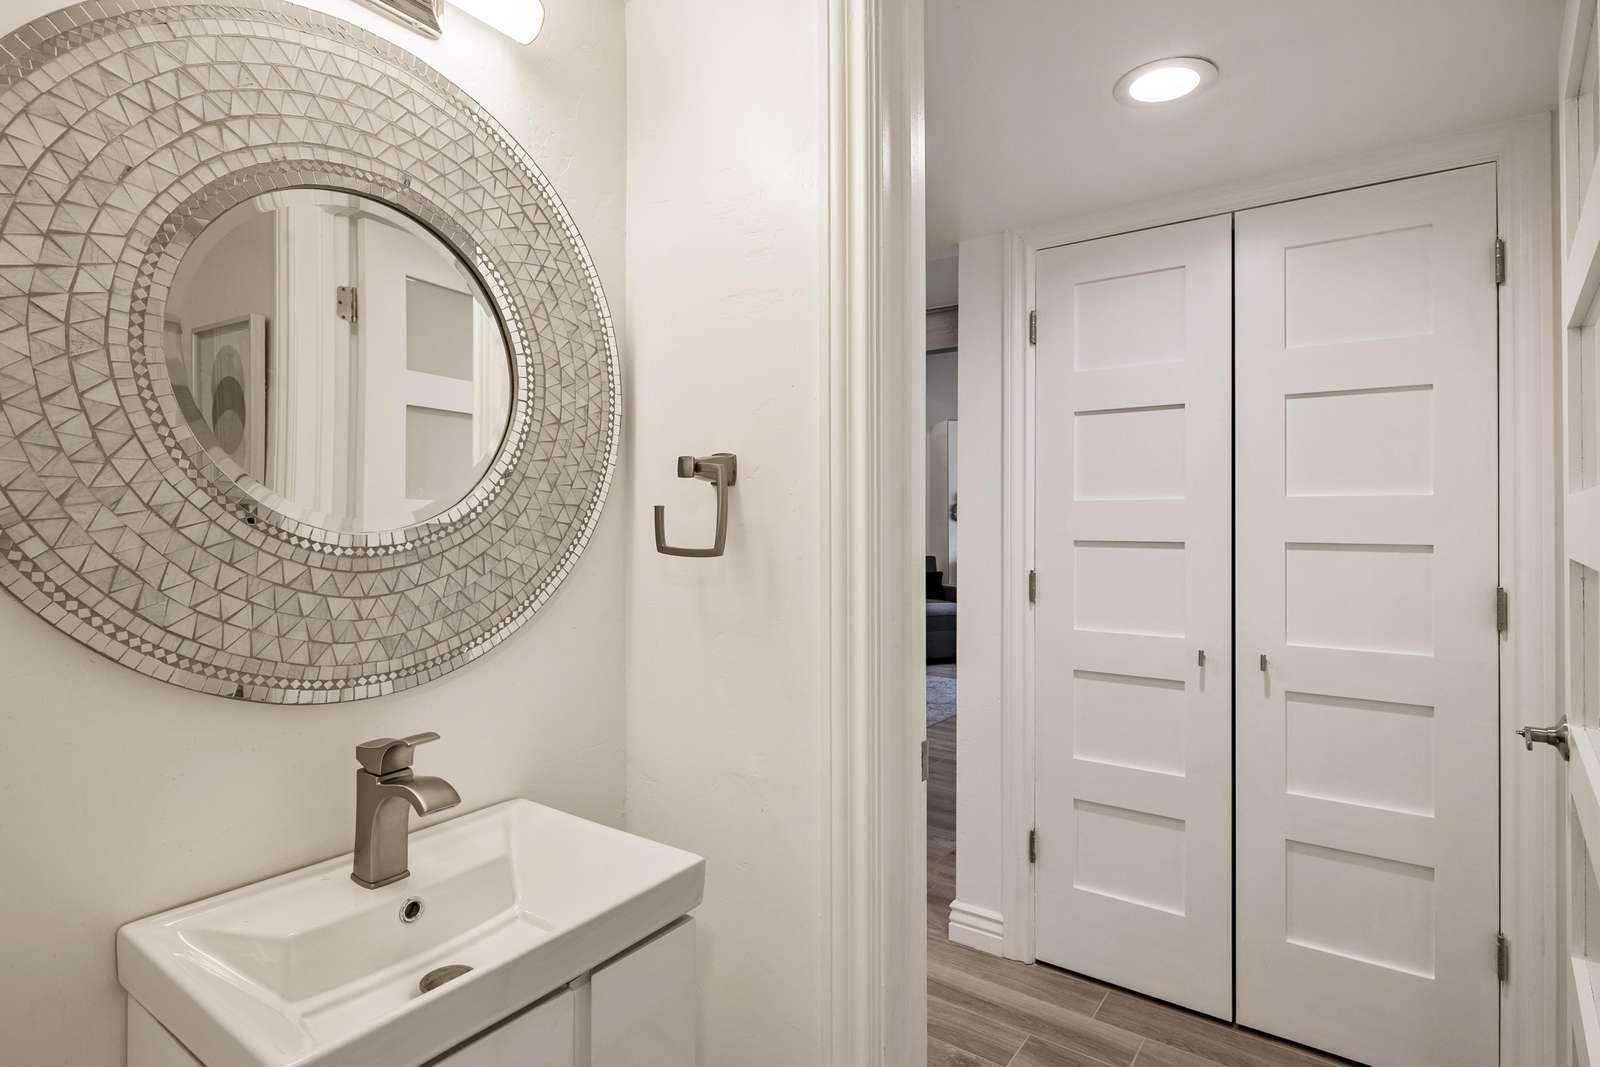 Bold mirror in main bathroom